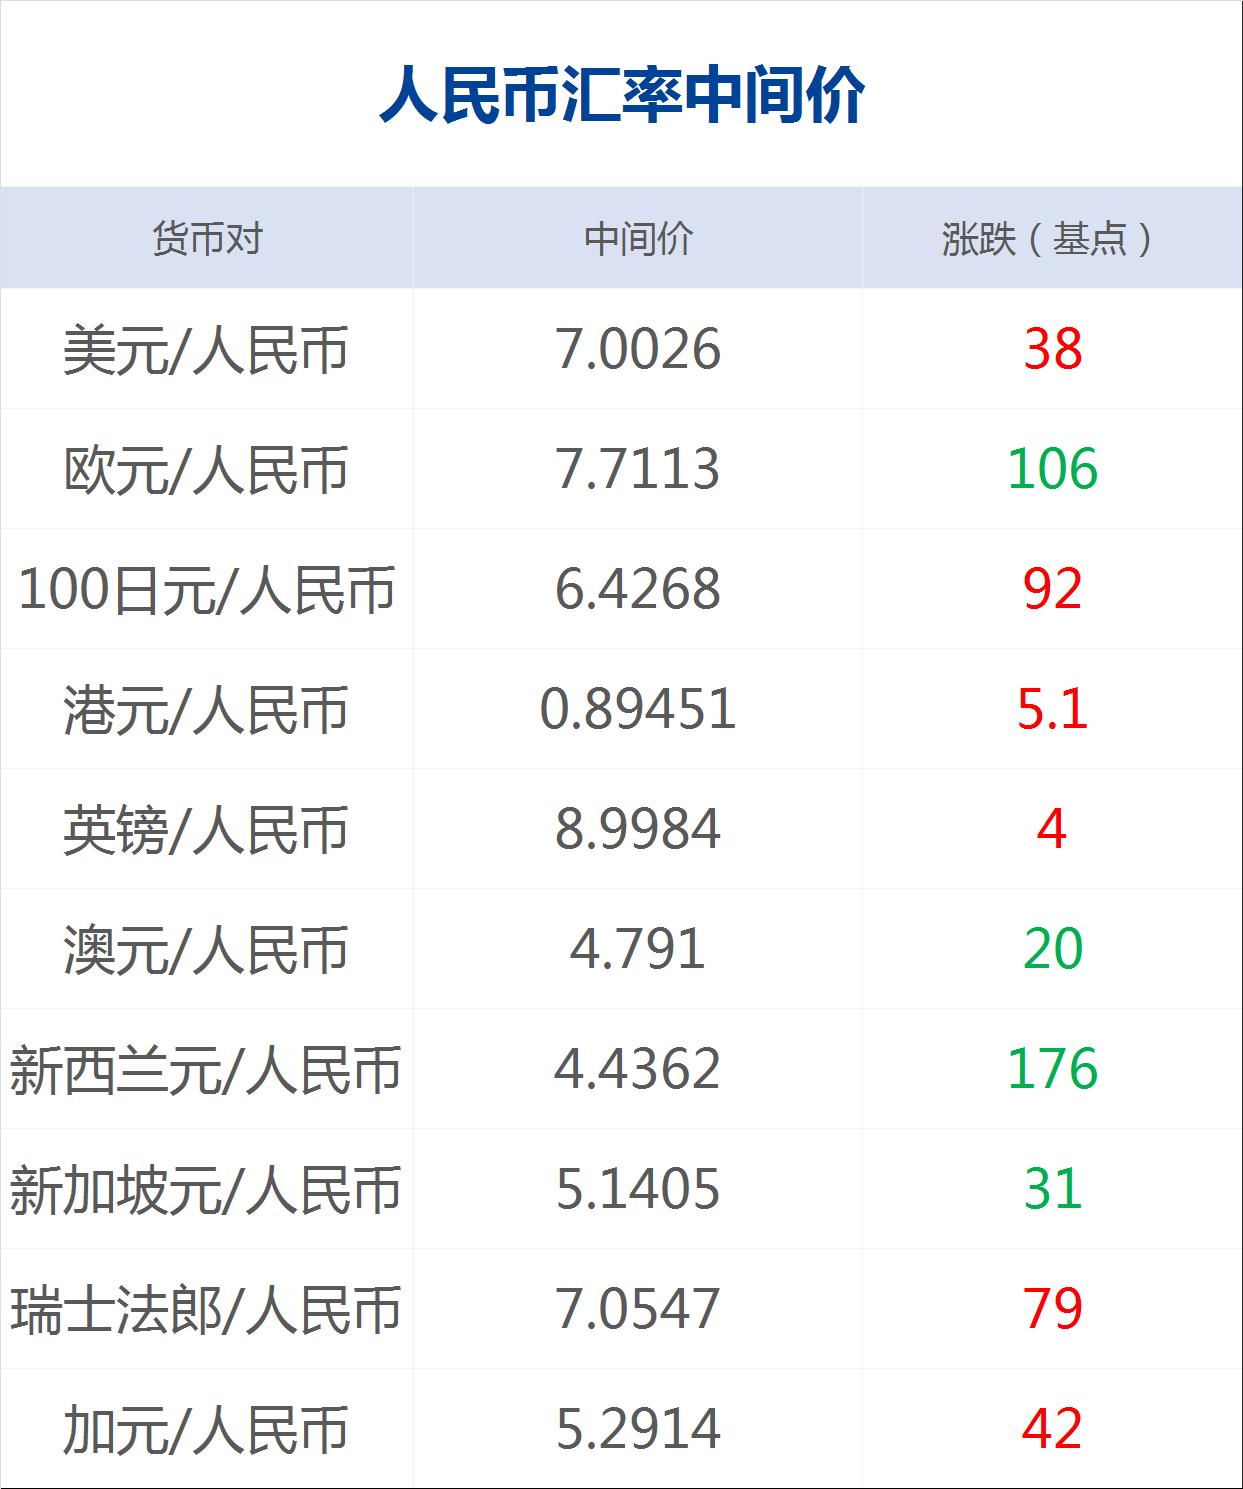 http://www.szminfu.com/youxiyule/29359.html